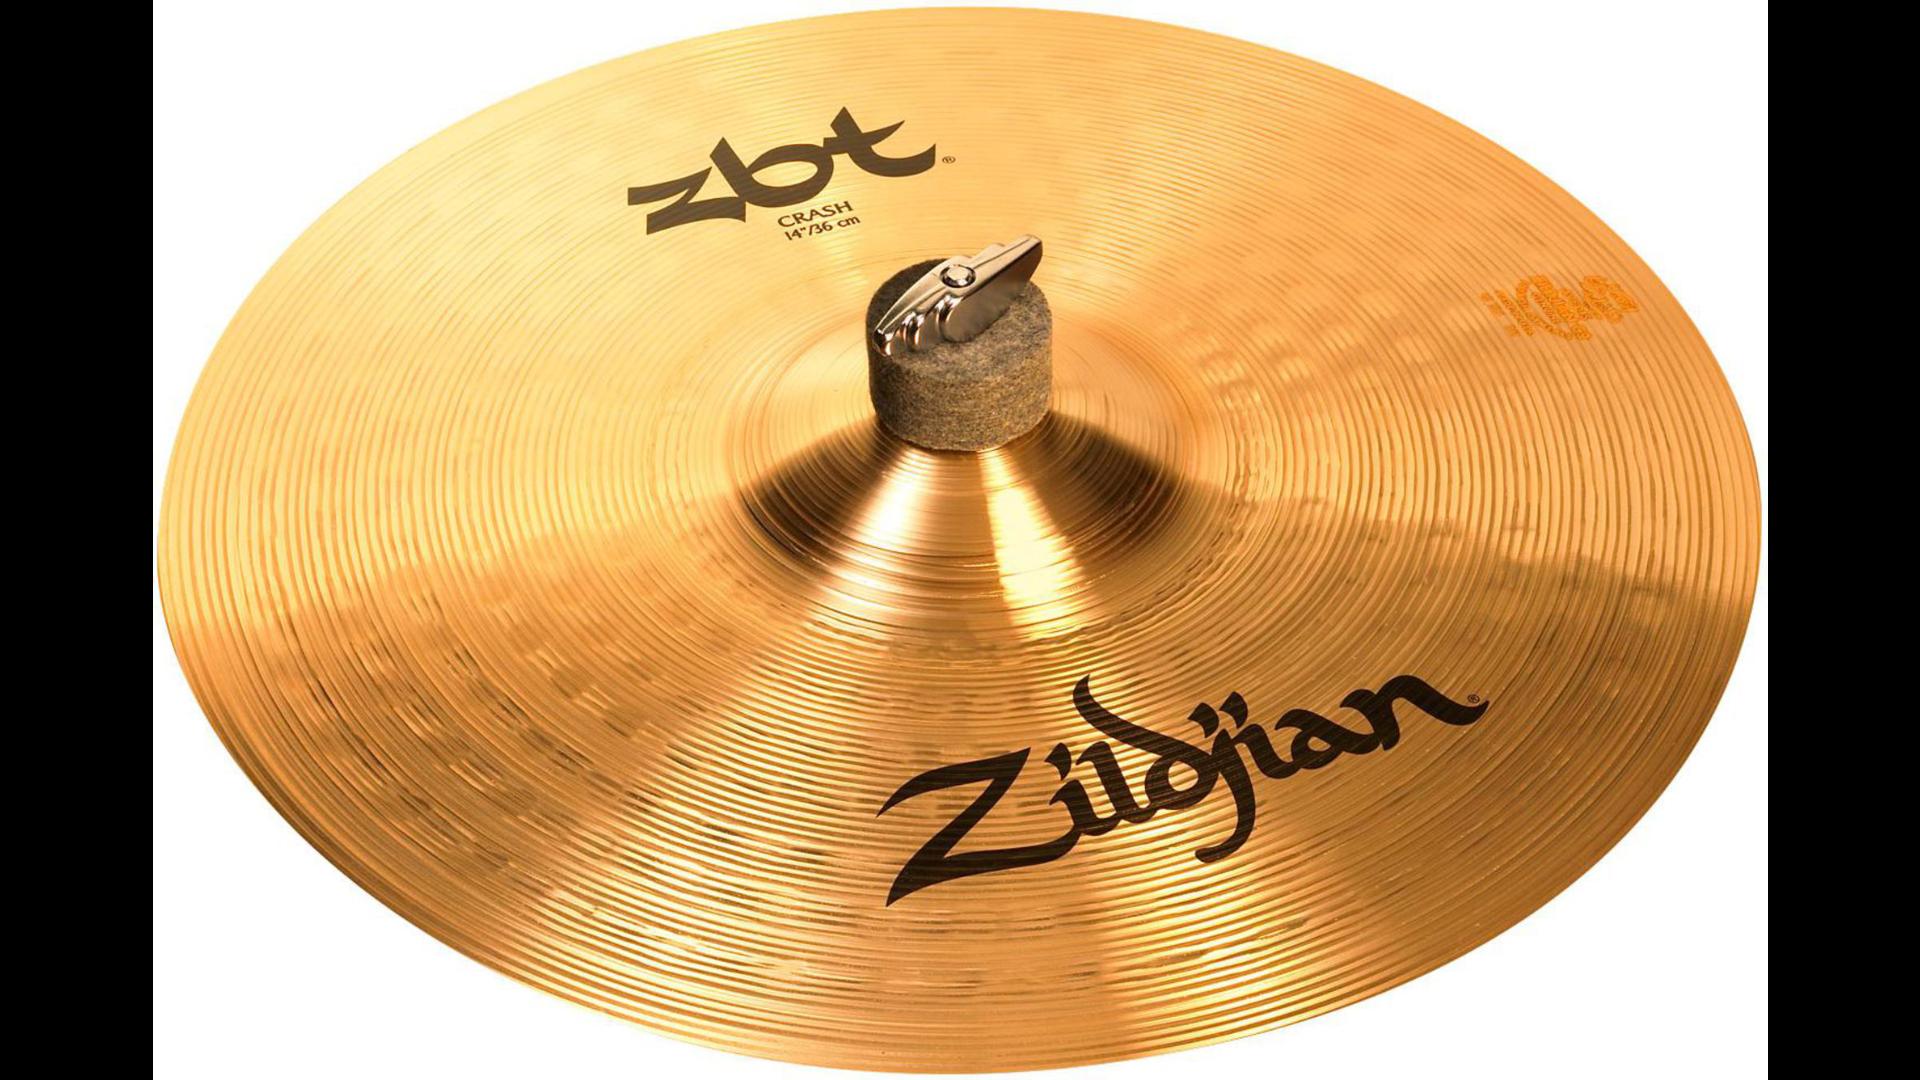 Zildjian ZBT 14 Crash Cymbal